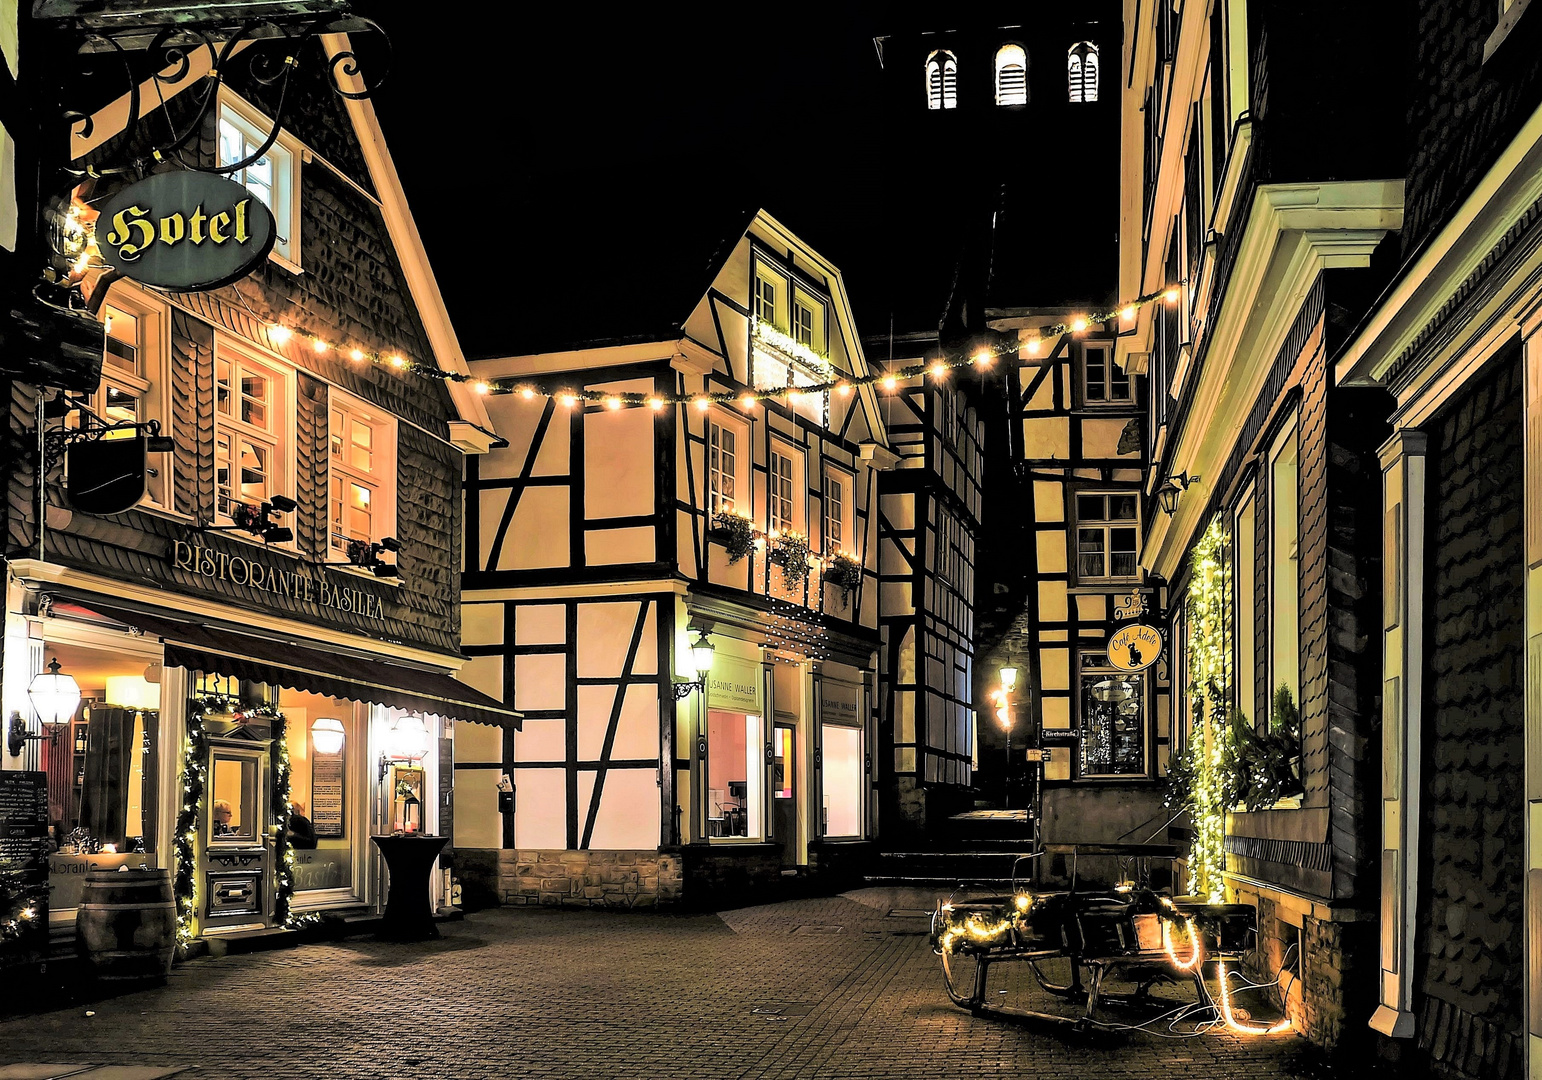 Abends in der Hattinger Altstadt